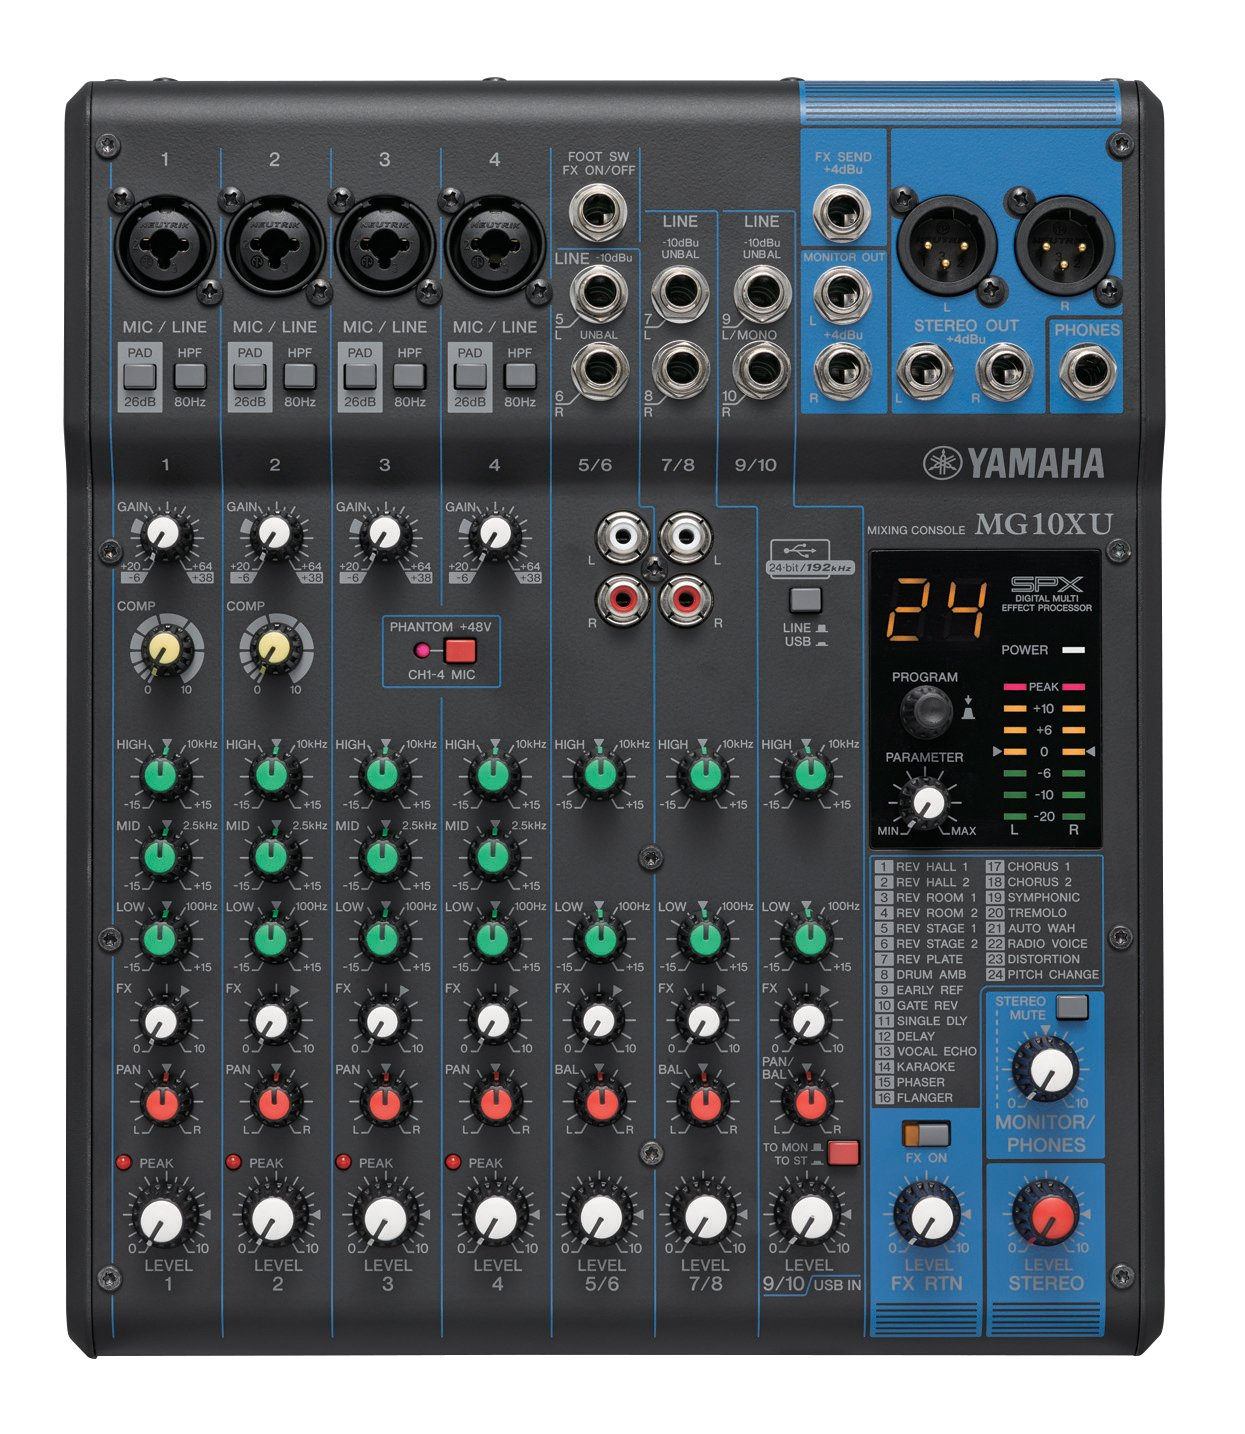 Yamaha MG10XU 10-Input Stereo Mixer with Effects by Yamaha